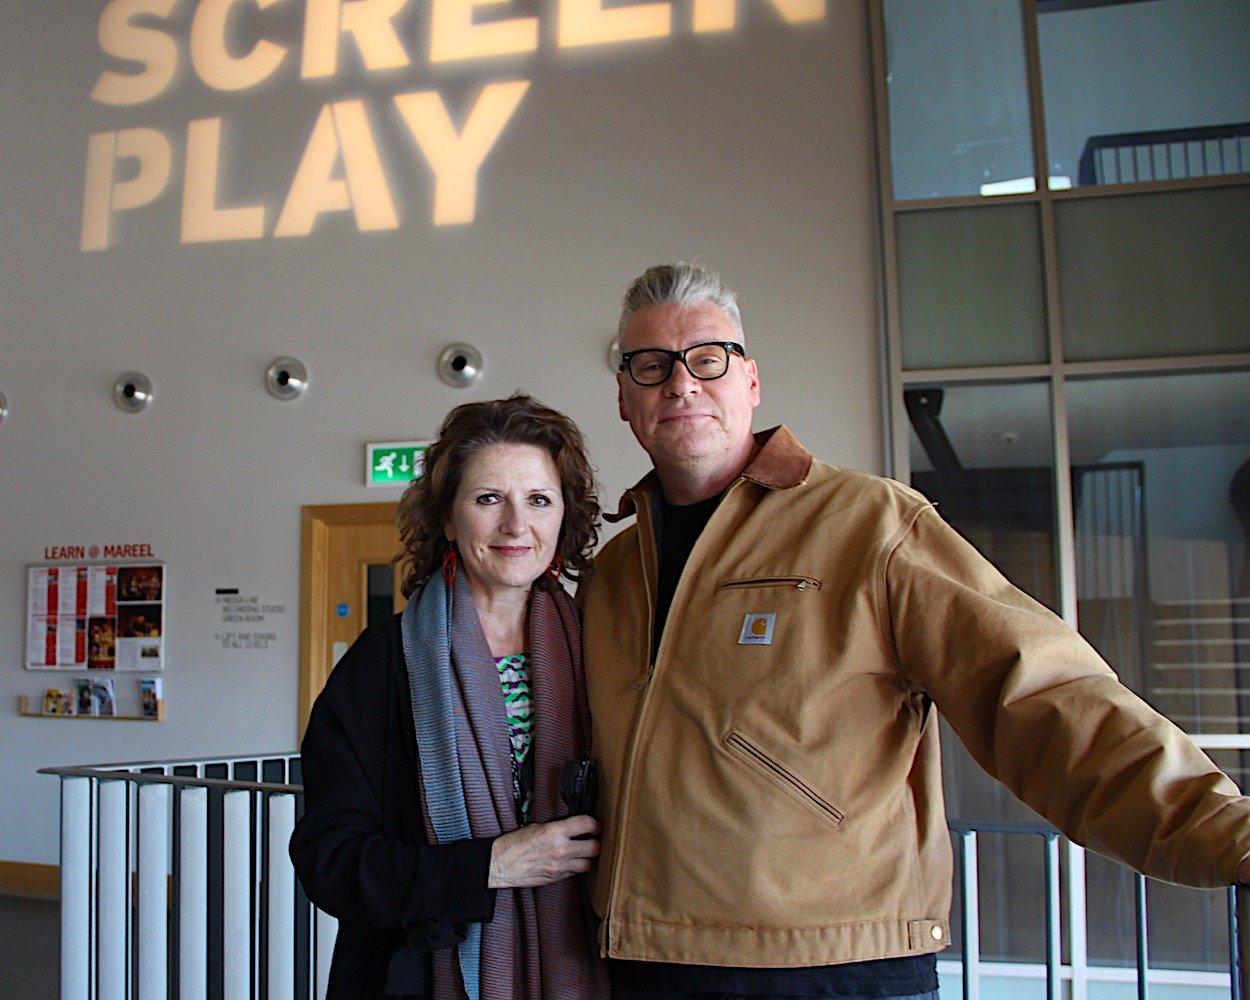 Screenplay: 'Come to Shetland next year'